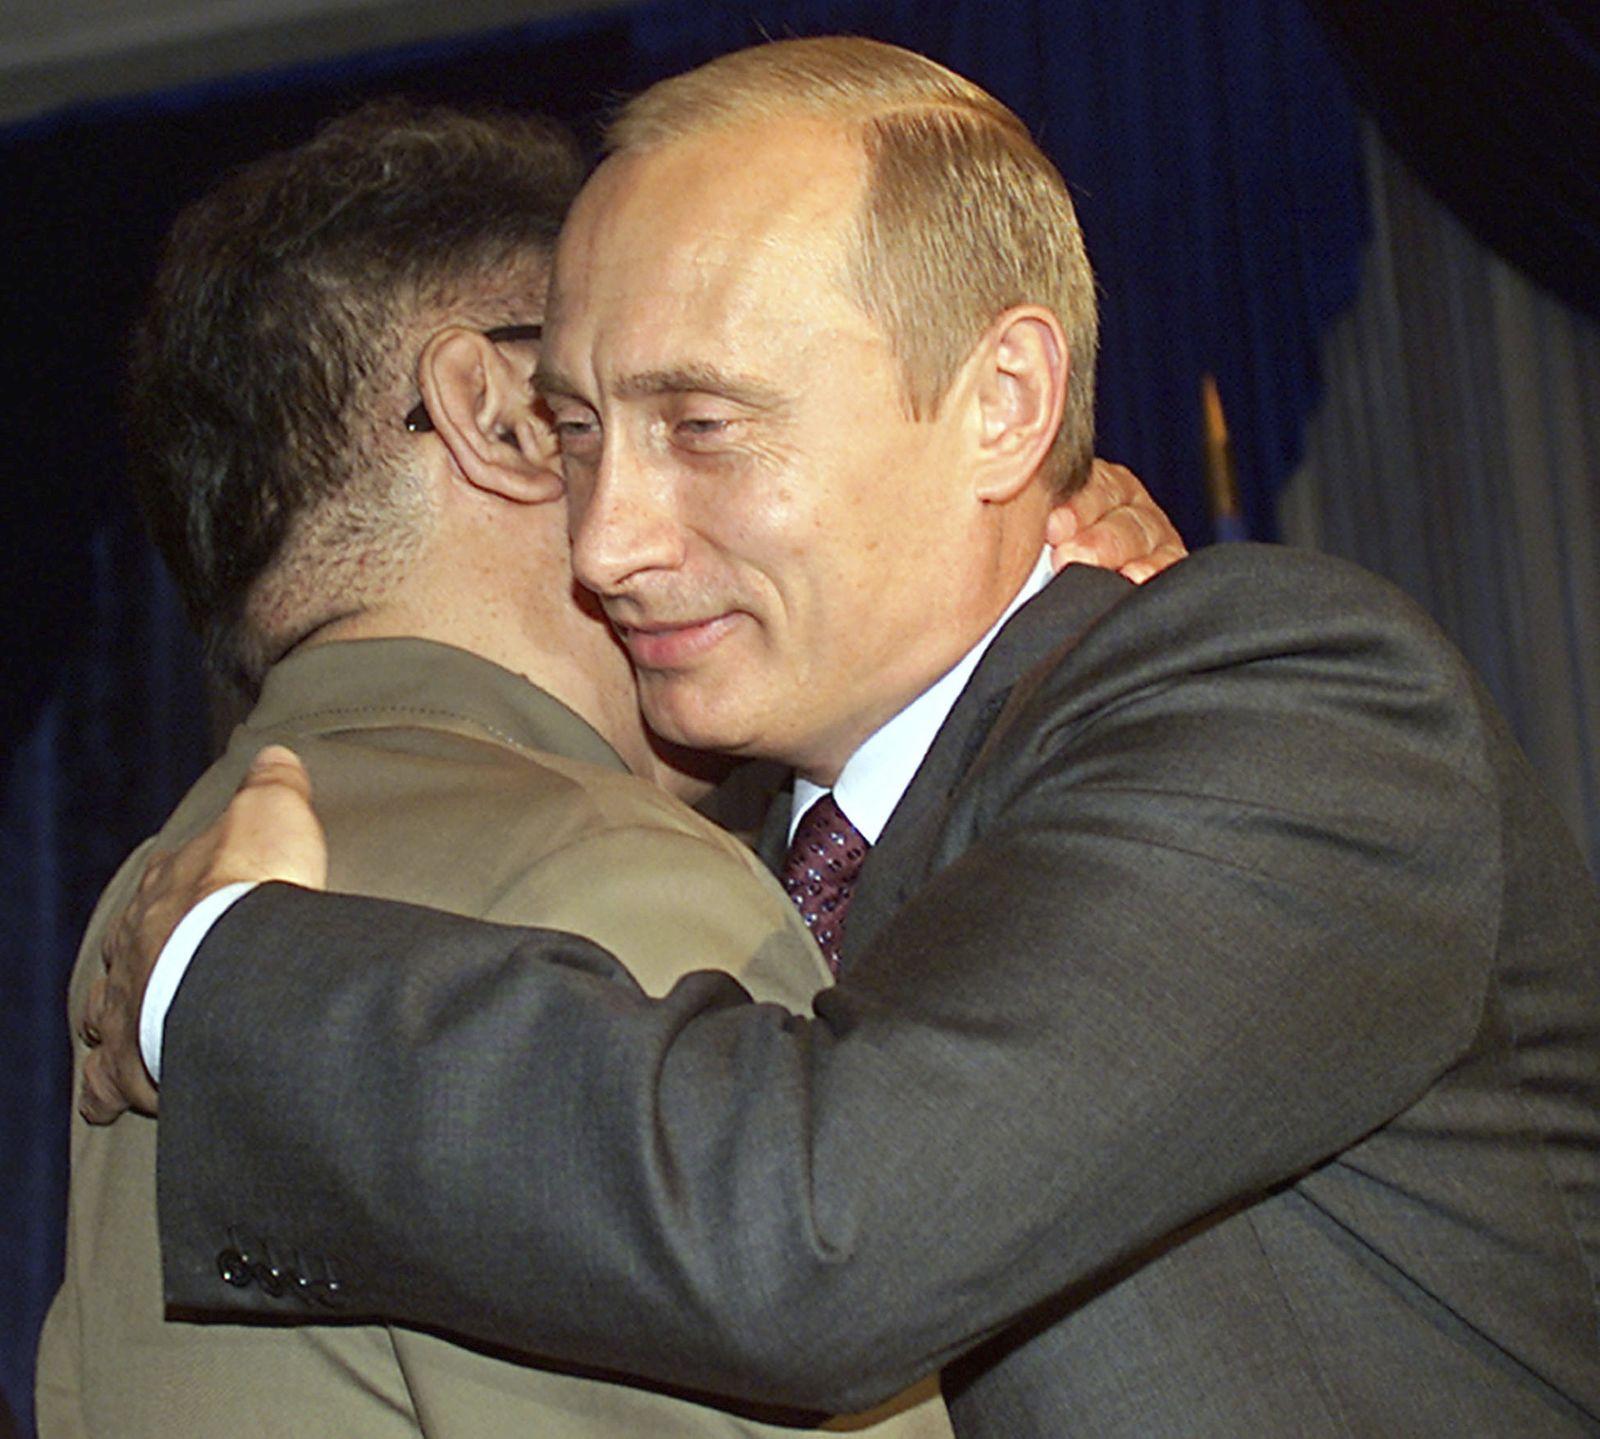 Norkorea/ Russland/ Kim jong il/ Putin